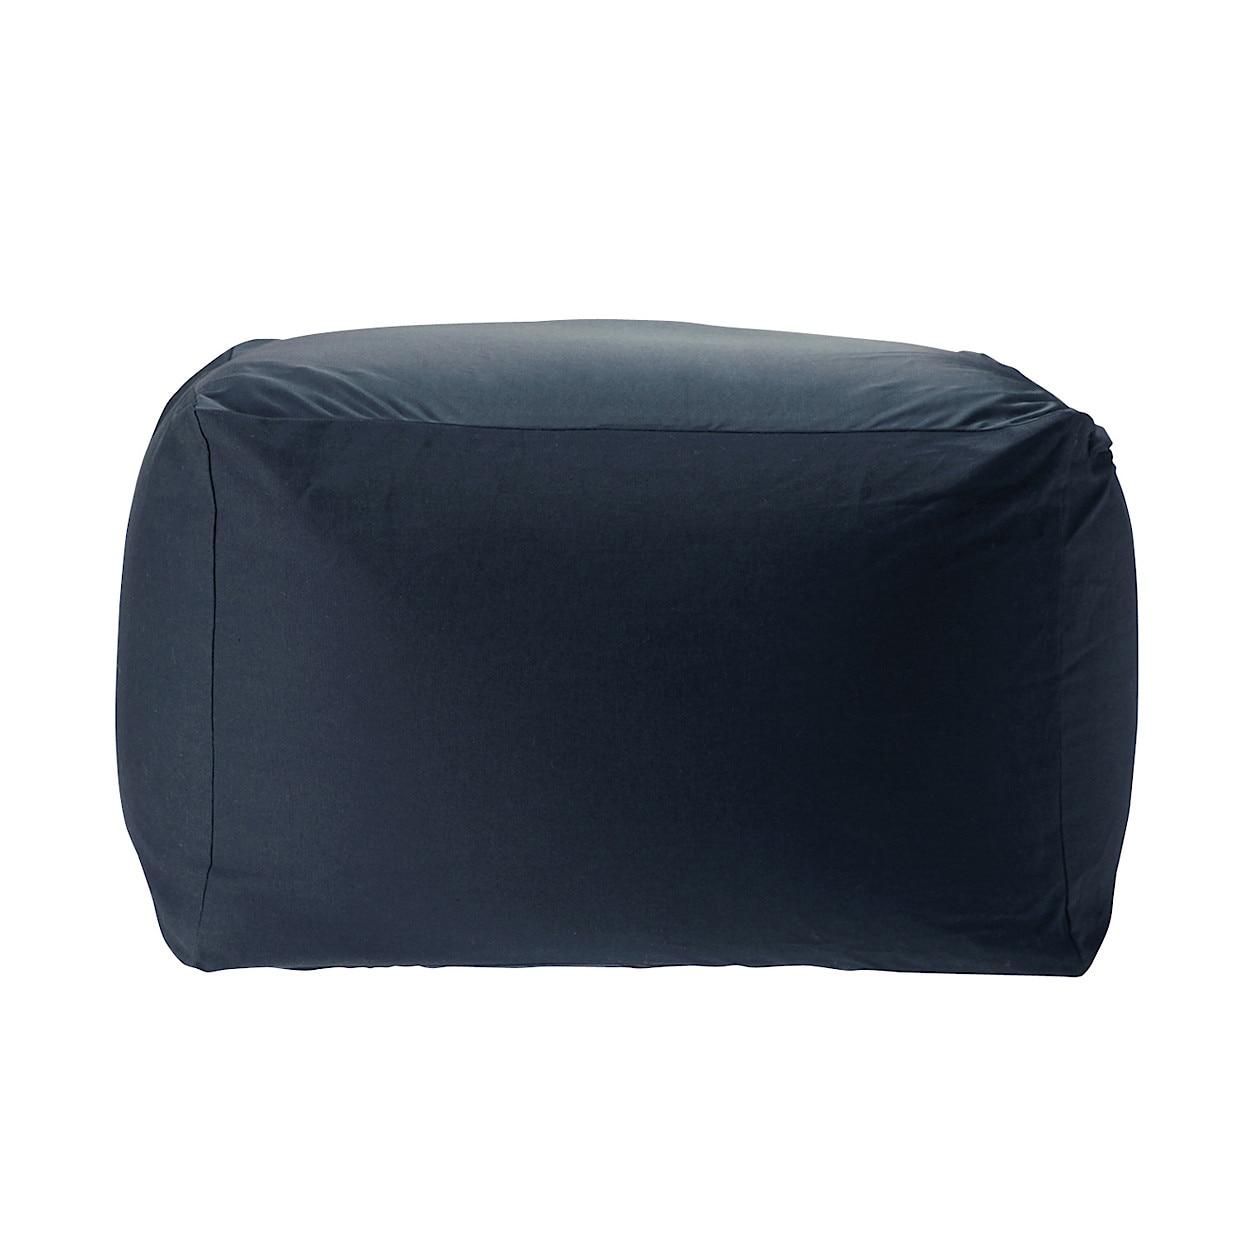 navy sofa cover buchannan microfiber assembly beads w65 d65 h43cm muji